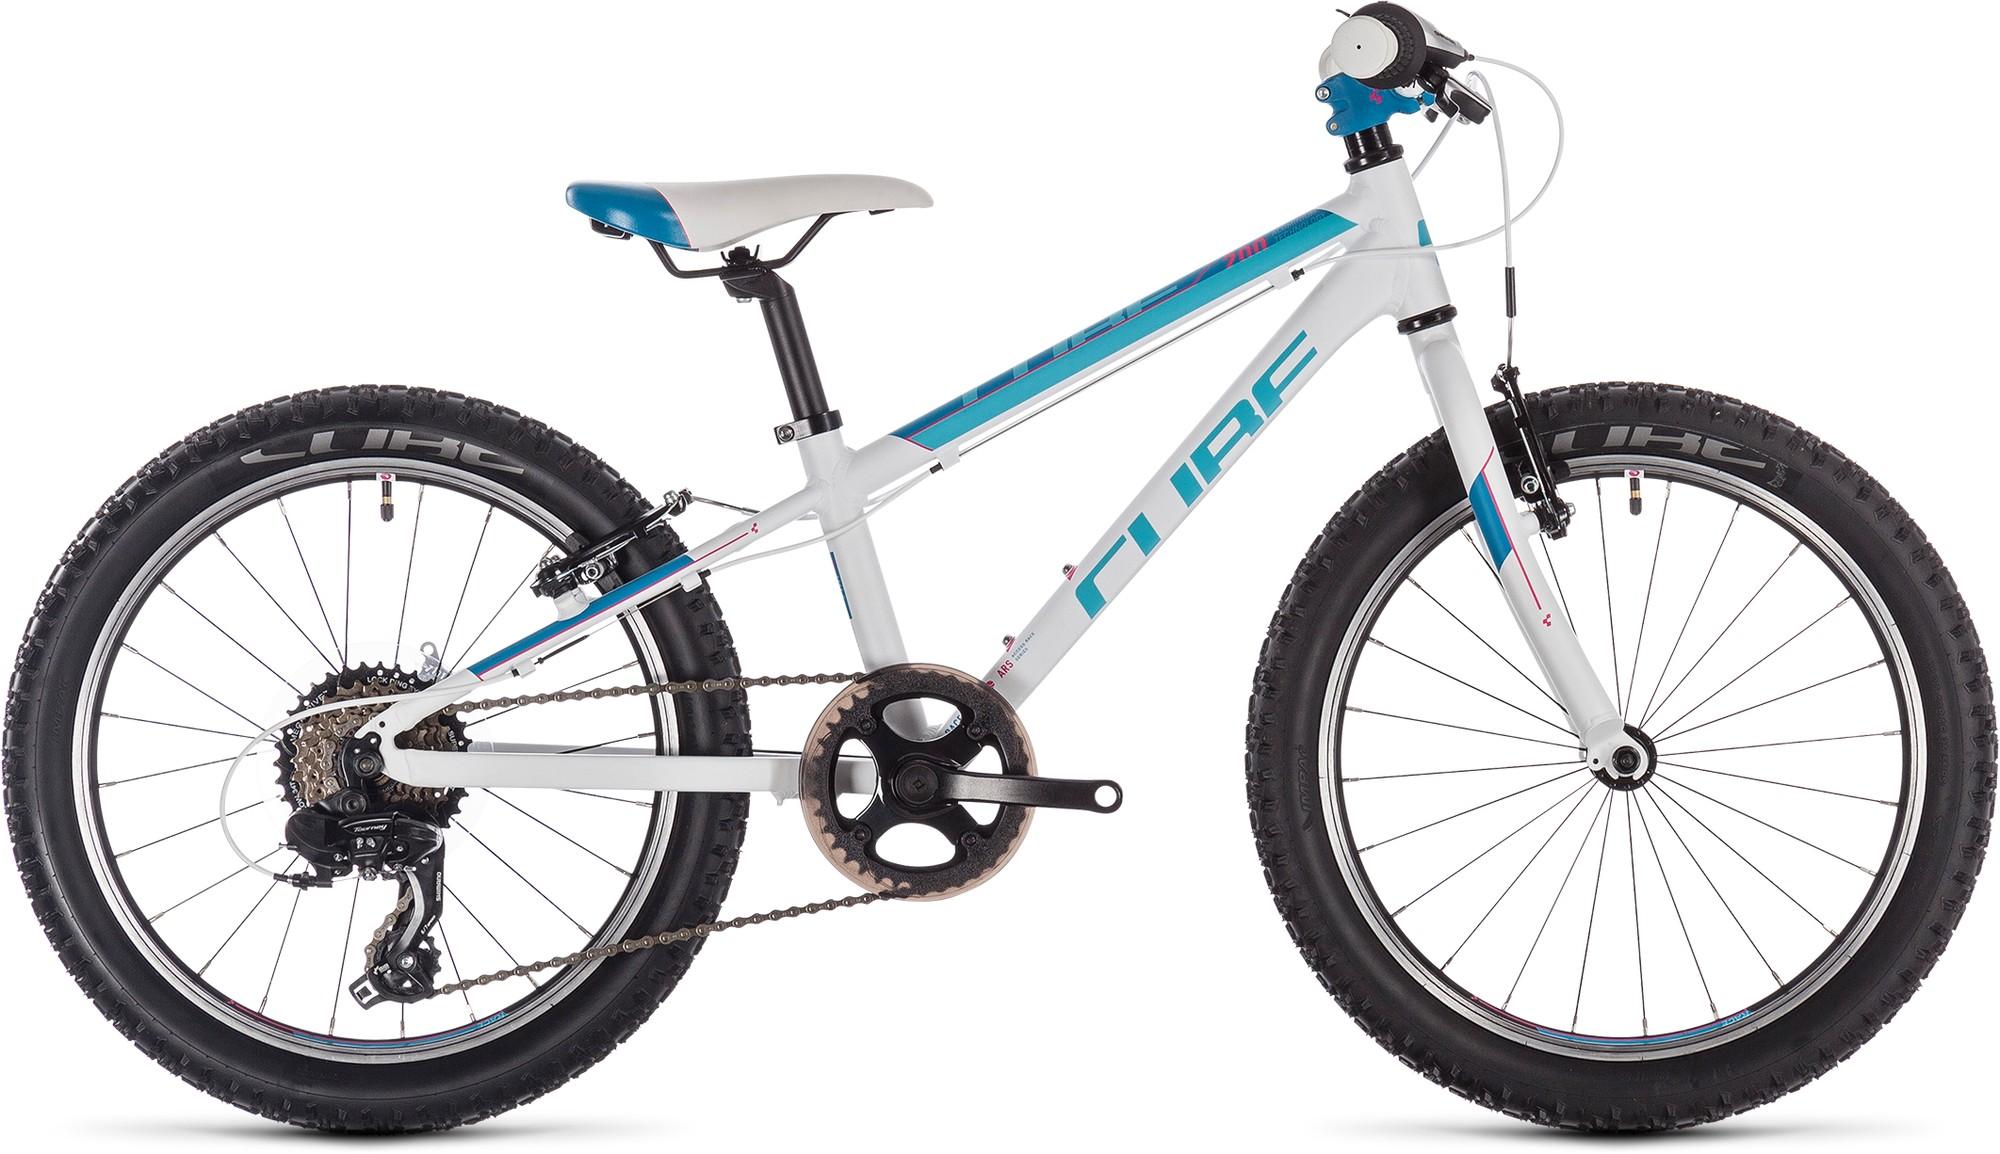 Cube Велосипед детский CUBE Access 200 велосипед cube hyde 2018